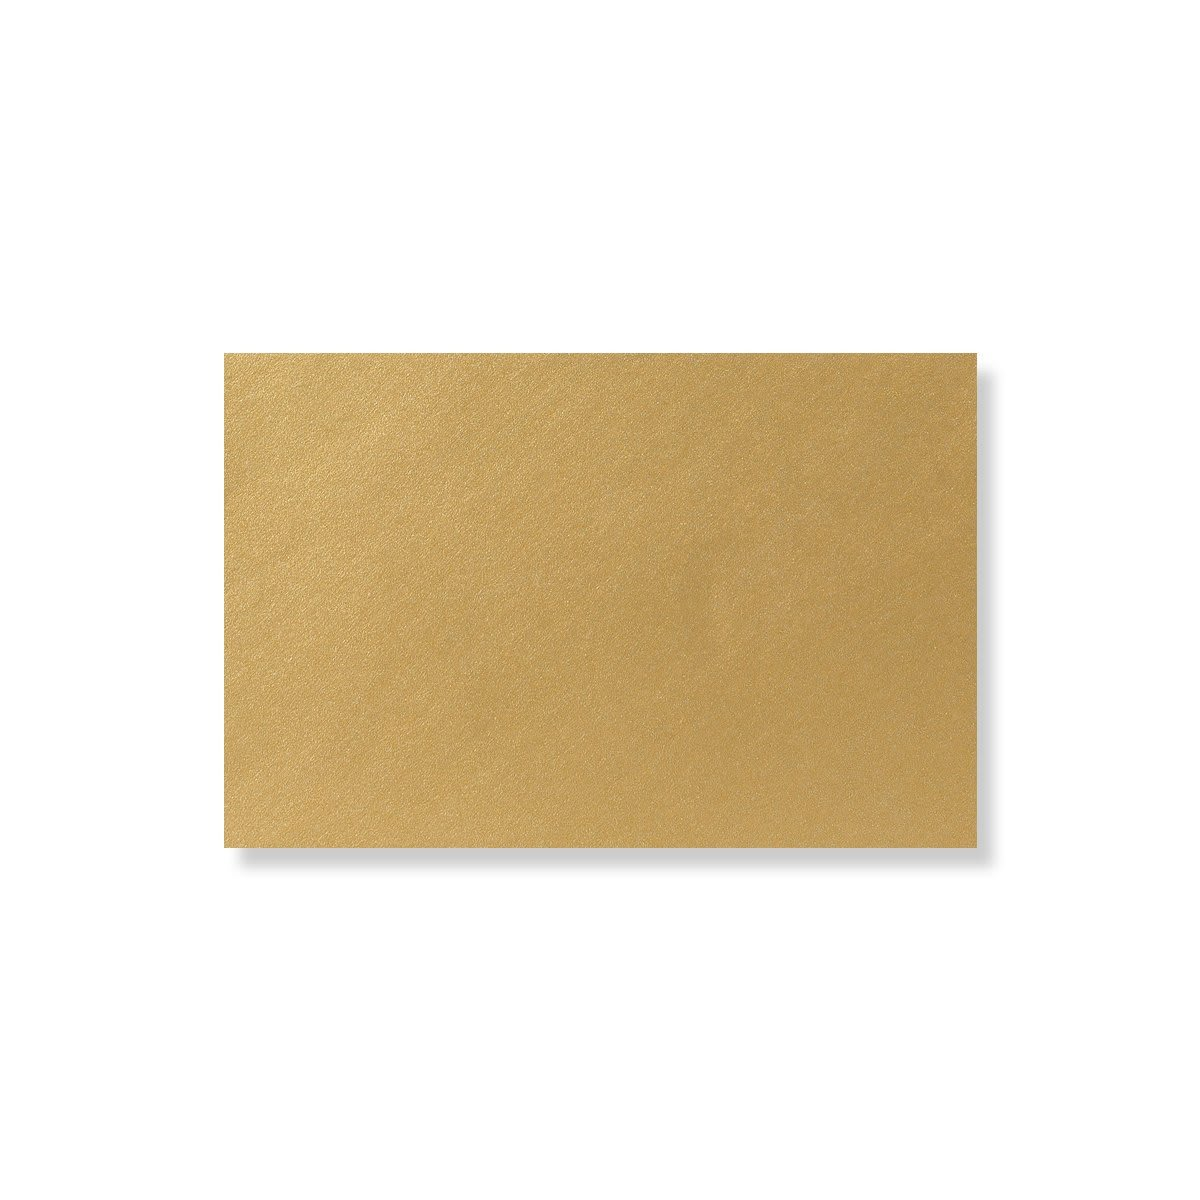 62 x 94MM GOLD PEARLESCENT ENVELOPES